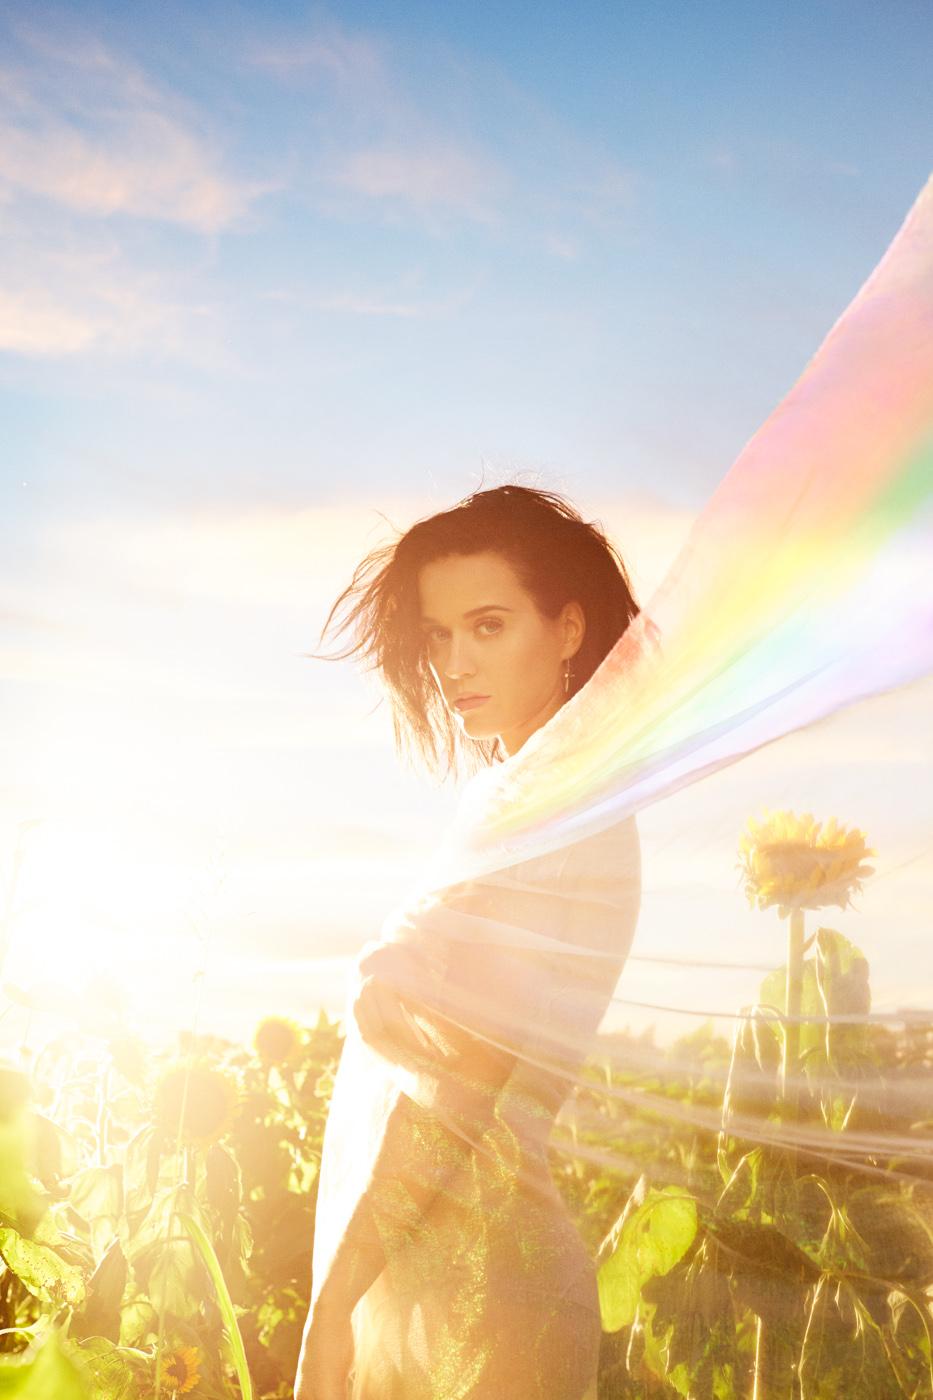 Katy Perry, Prism Album, October 18, 2013.